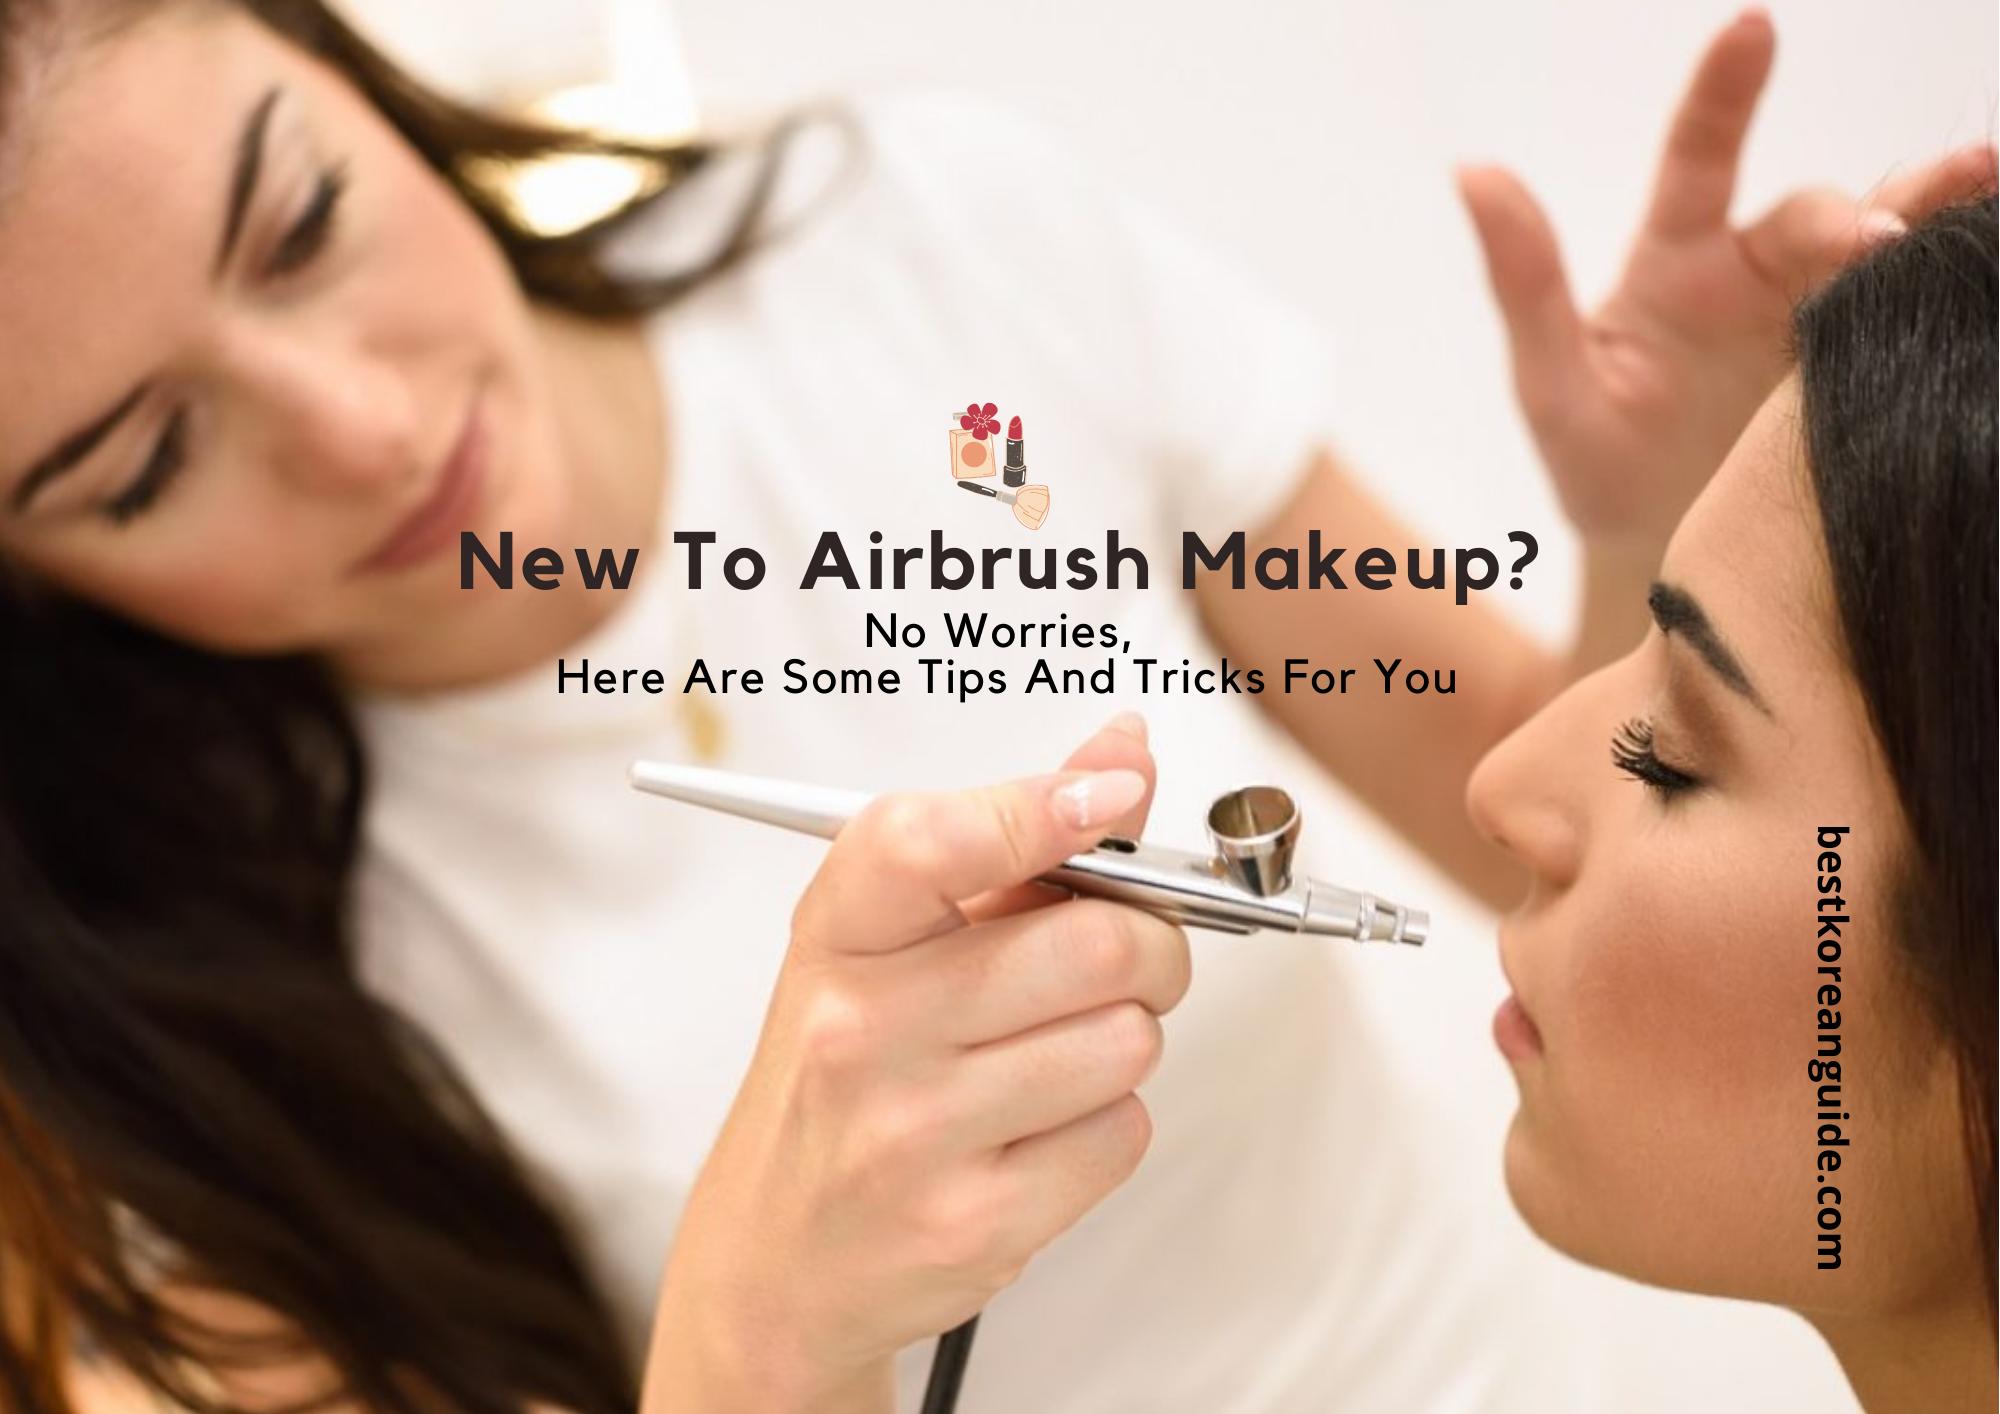 Airbrush Makeup- Tips and Tricks